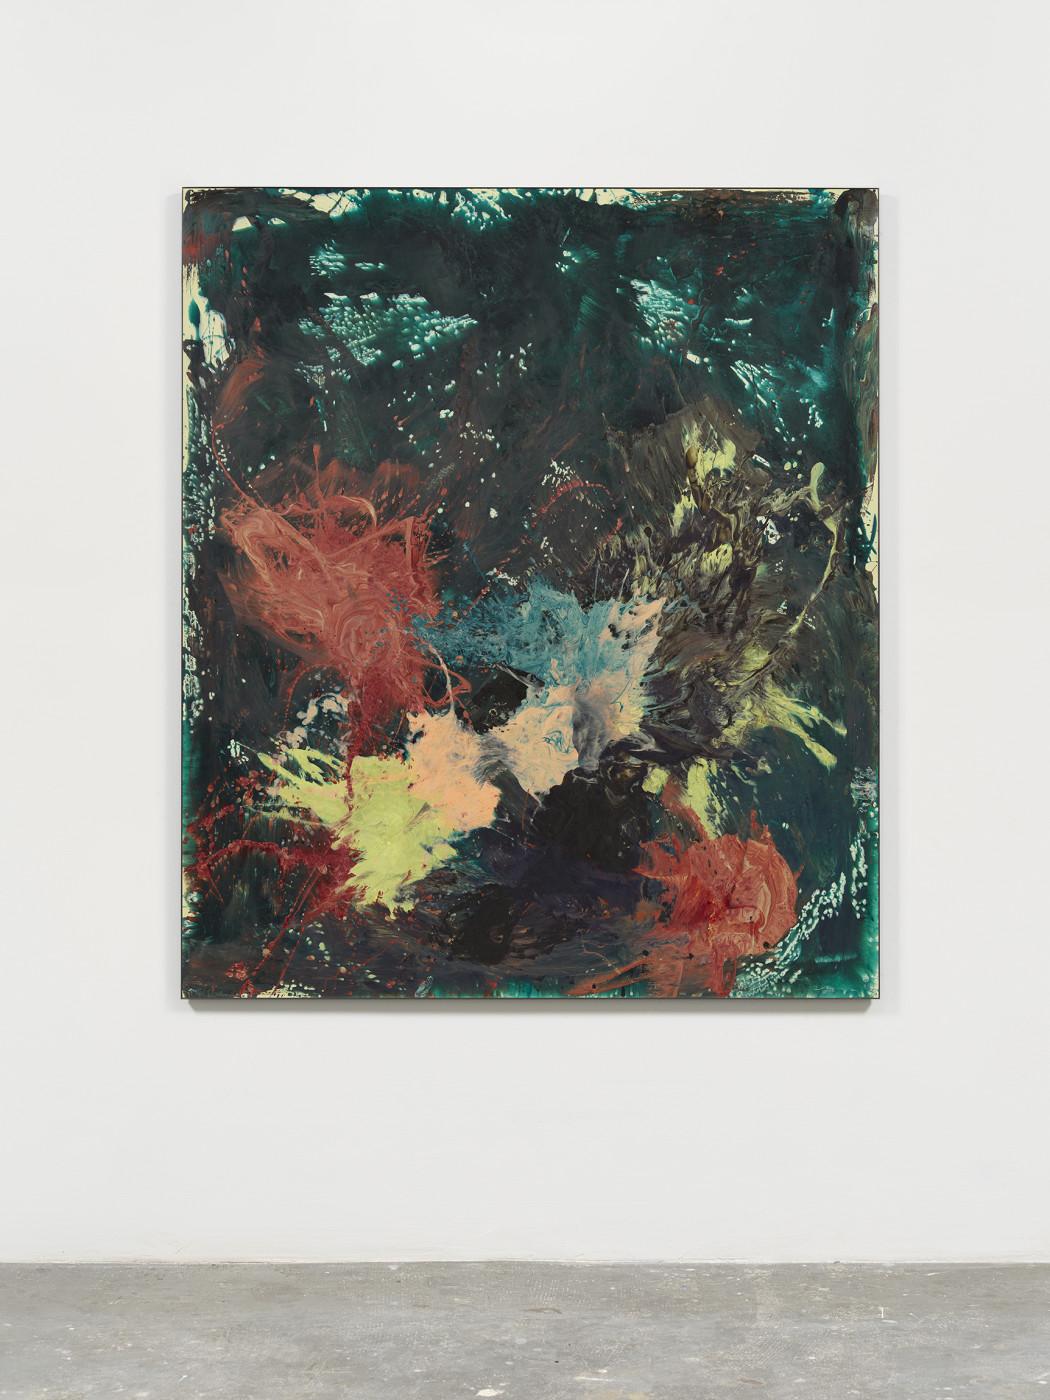 <p><i>Green Painting</i><br /><span>2019</span><br /><span>Cast urethane resin, fiberglass, epoxy</span><br /><span>69.5 x 60 in</span></p>